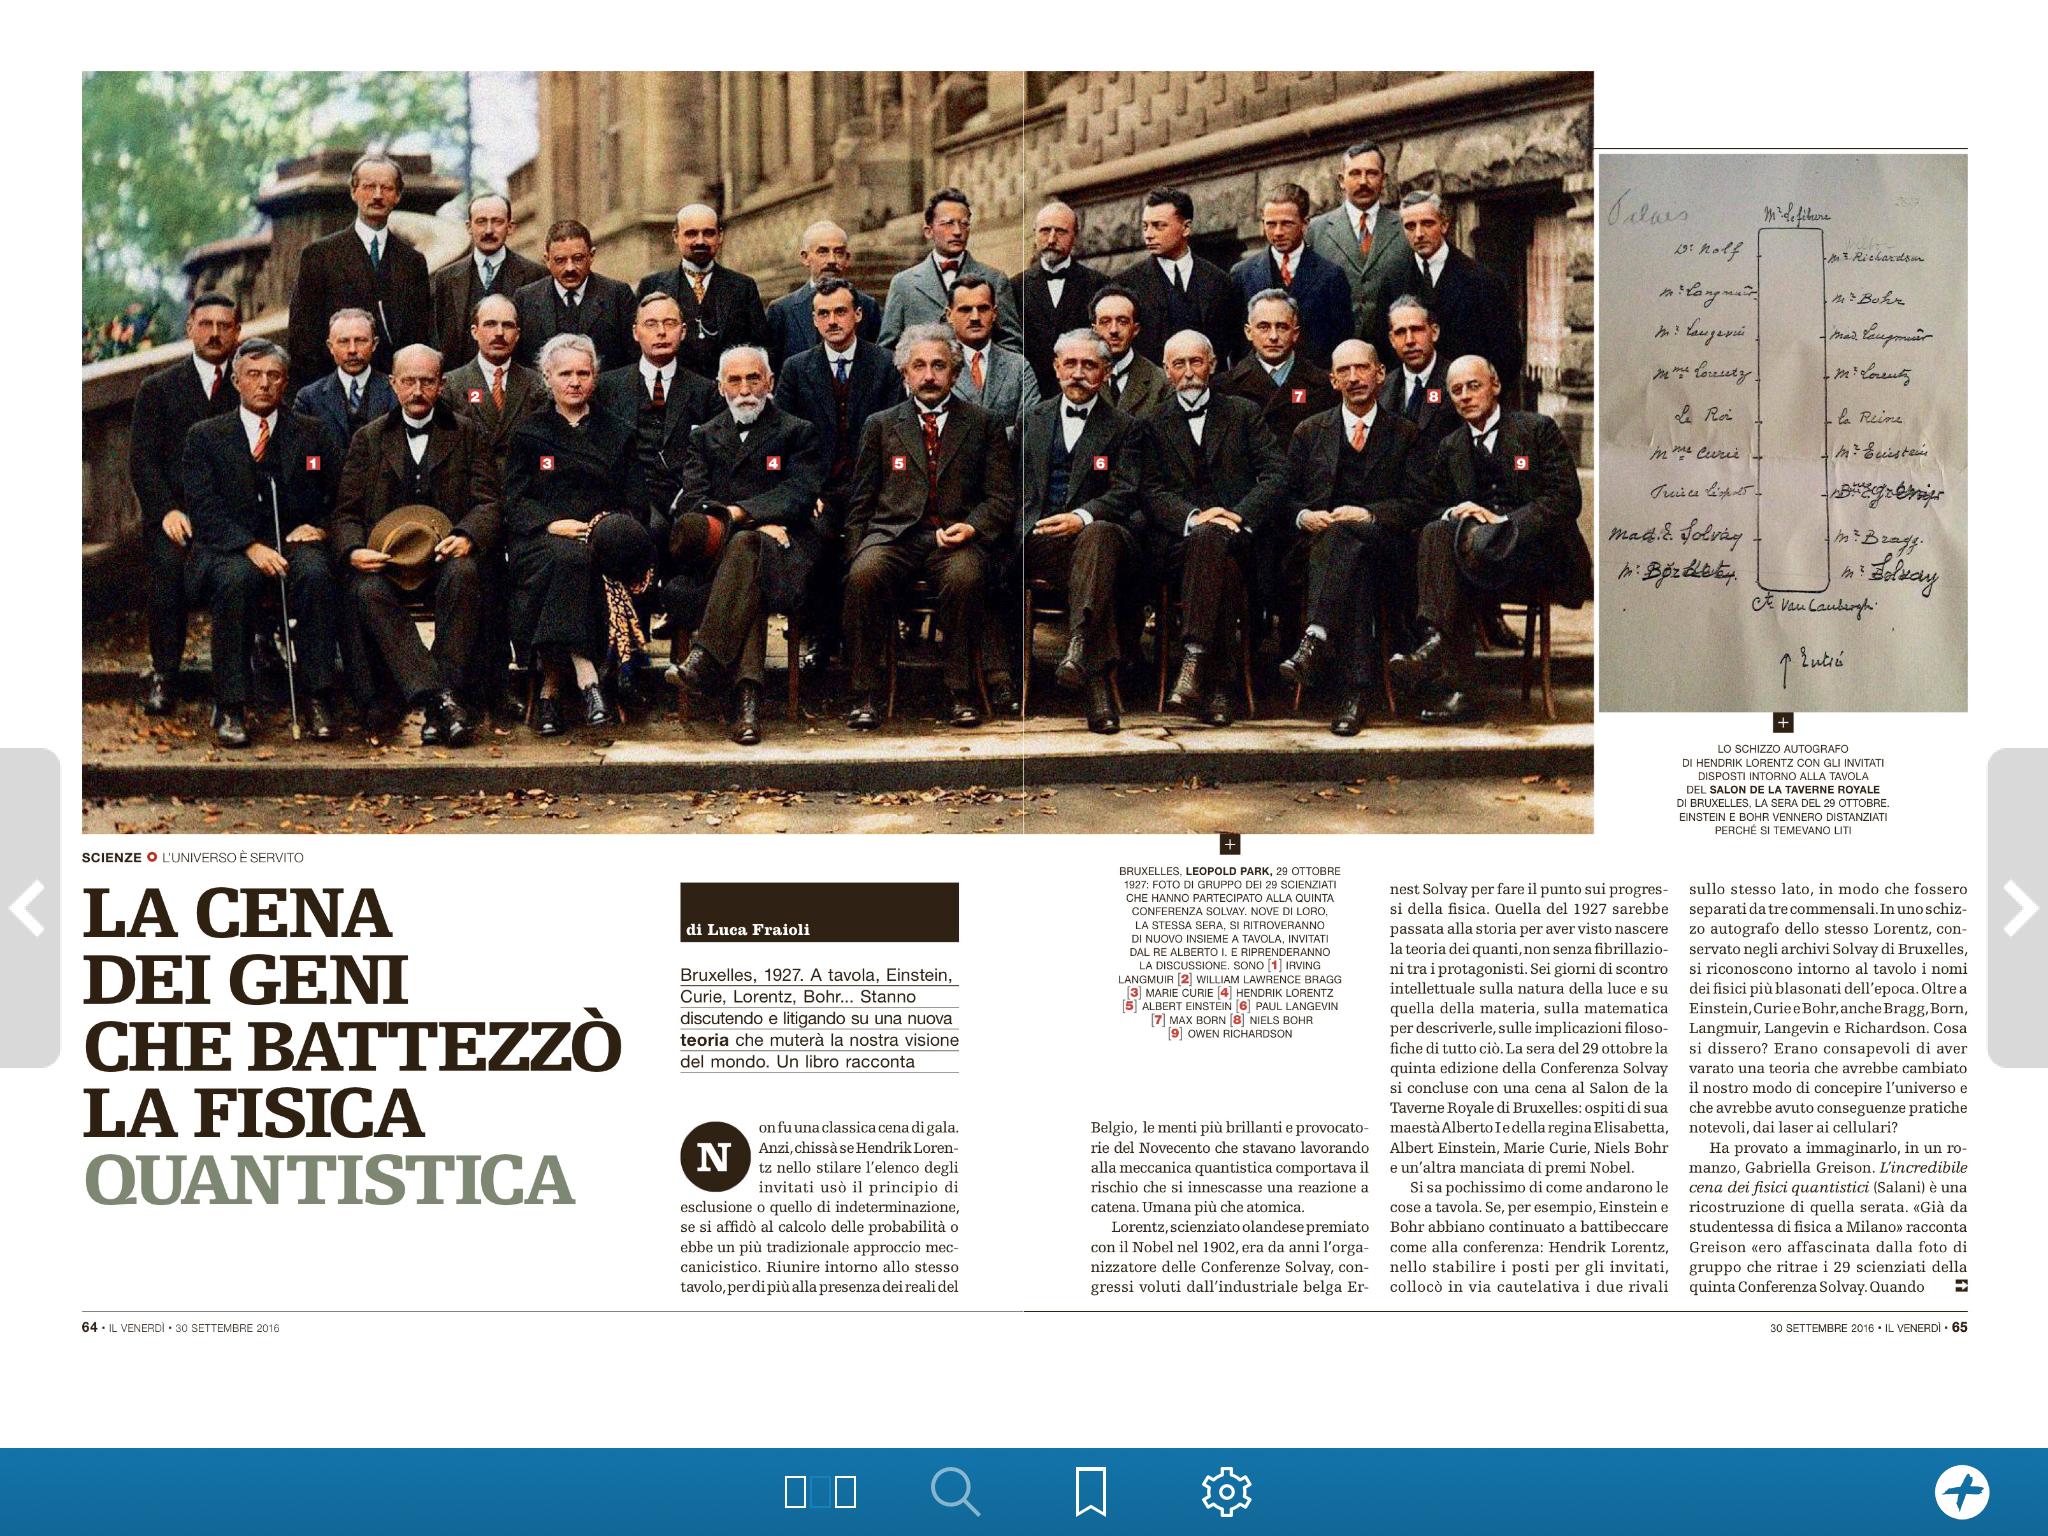 Sul Venerdì di Repubblica, 3 pagine dedicate a L'INCREDIBILE CENA DEI FISICI QUANTISTICI! (rassegna stampa)